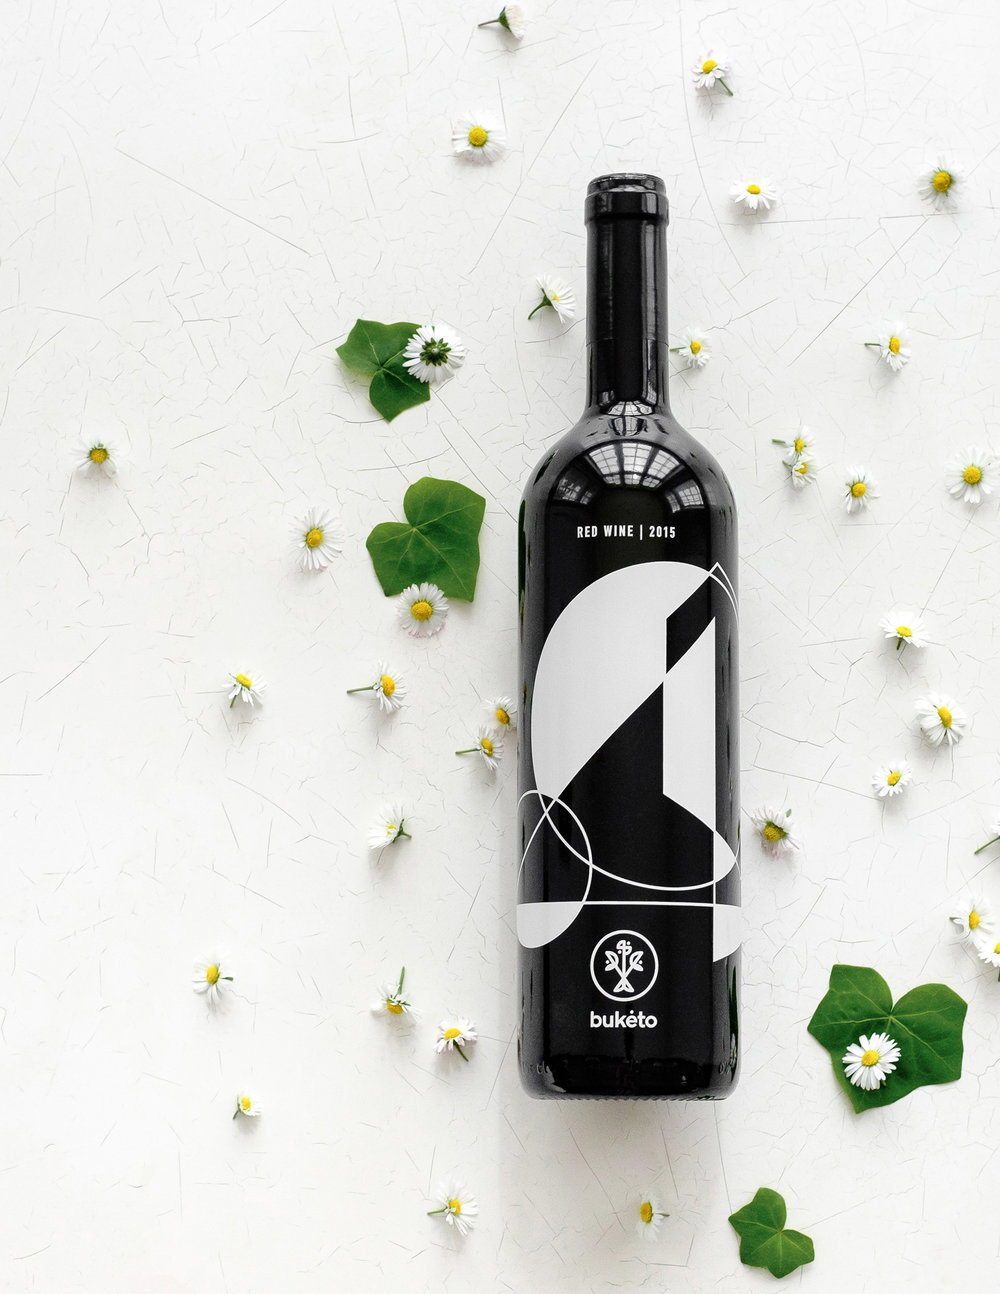 Buketo Red wine design by Lazy snail Design